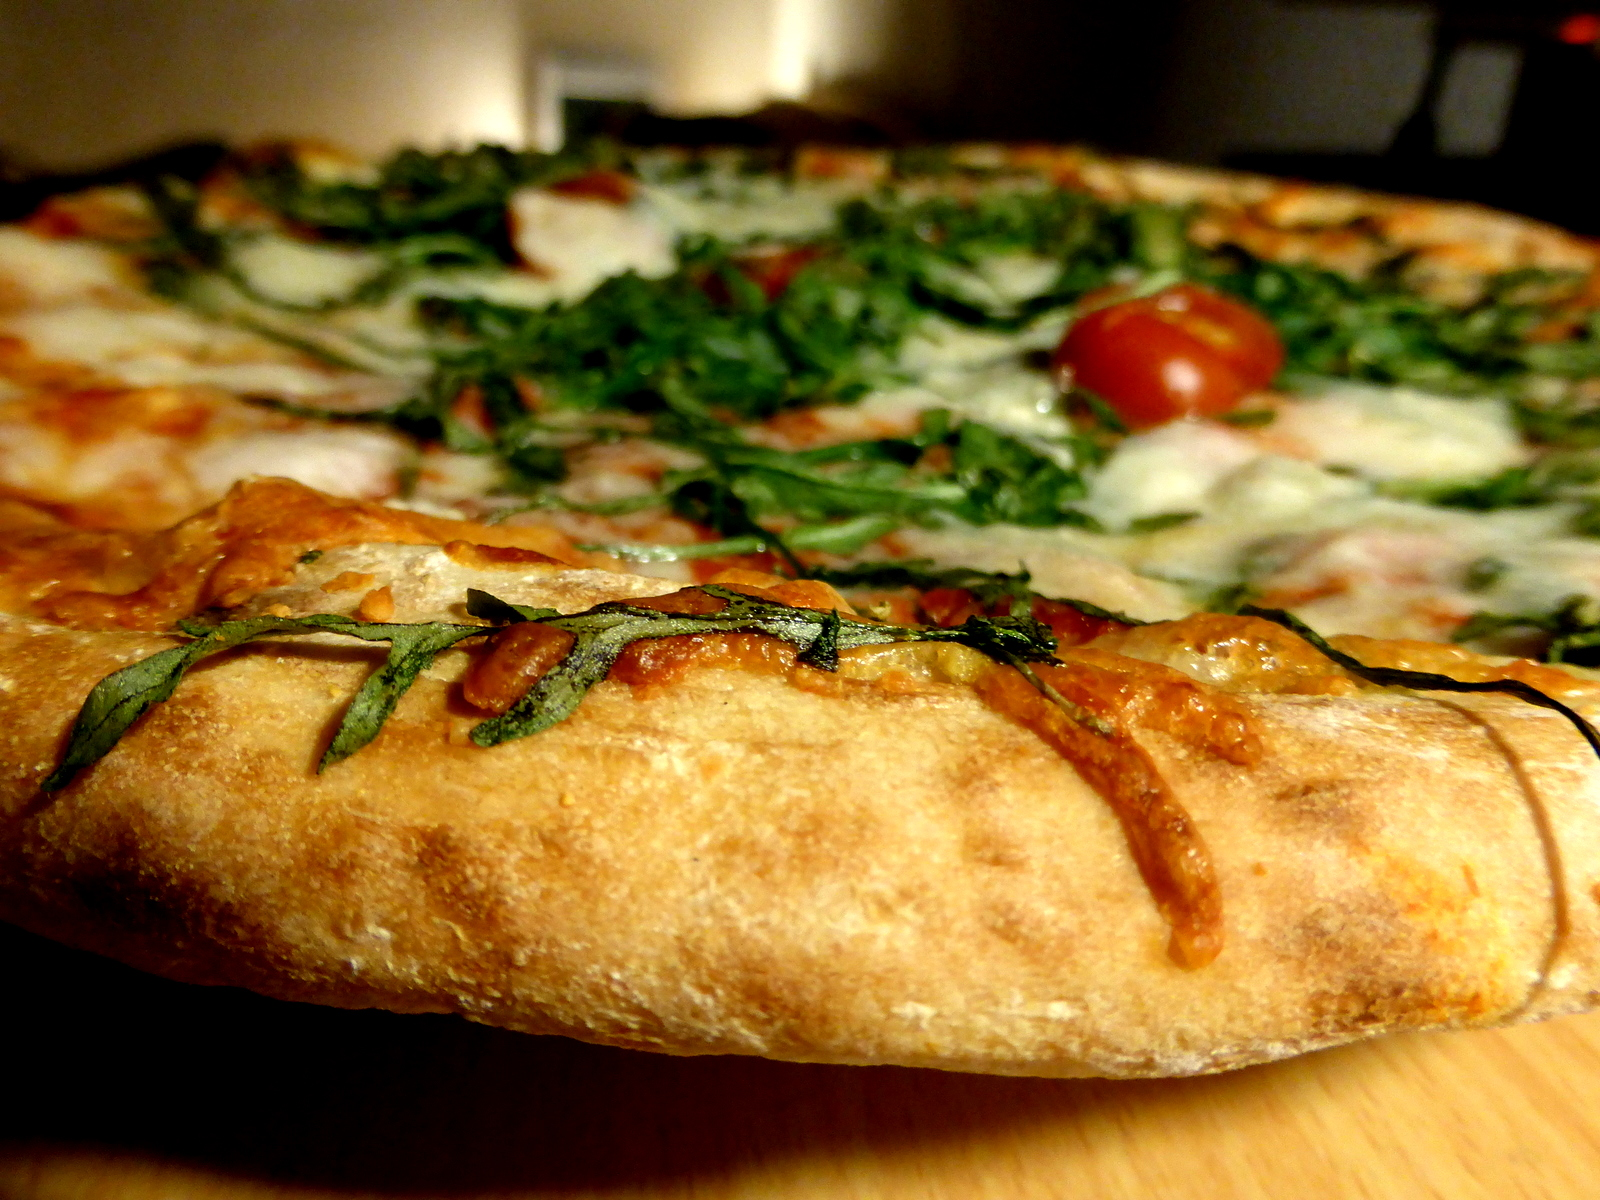 File:Vegetarian-pizza-close-up-crust.jpg - Wikimedia Commons